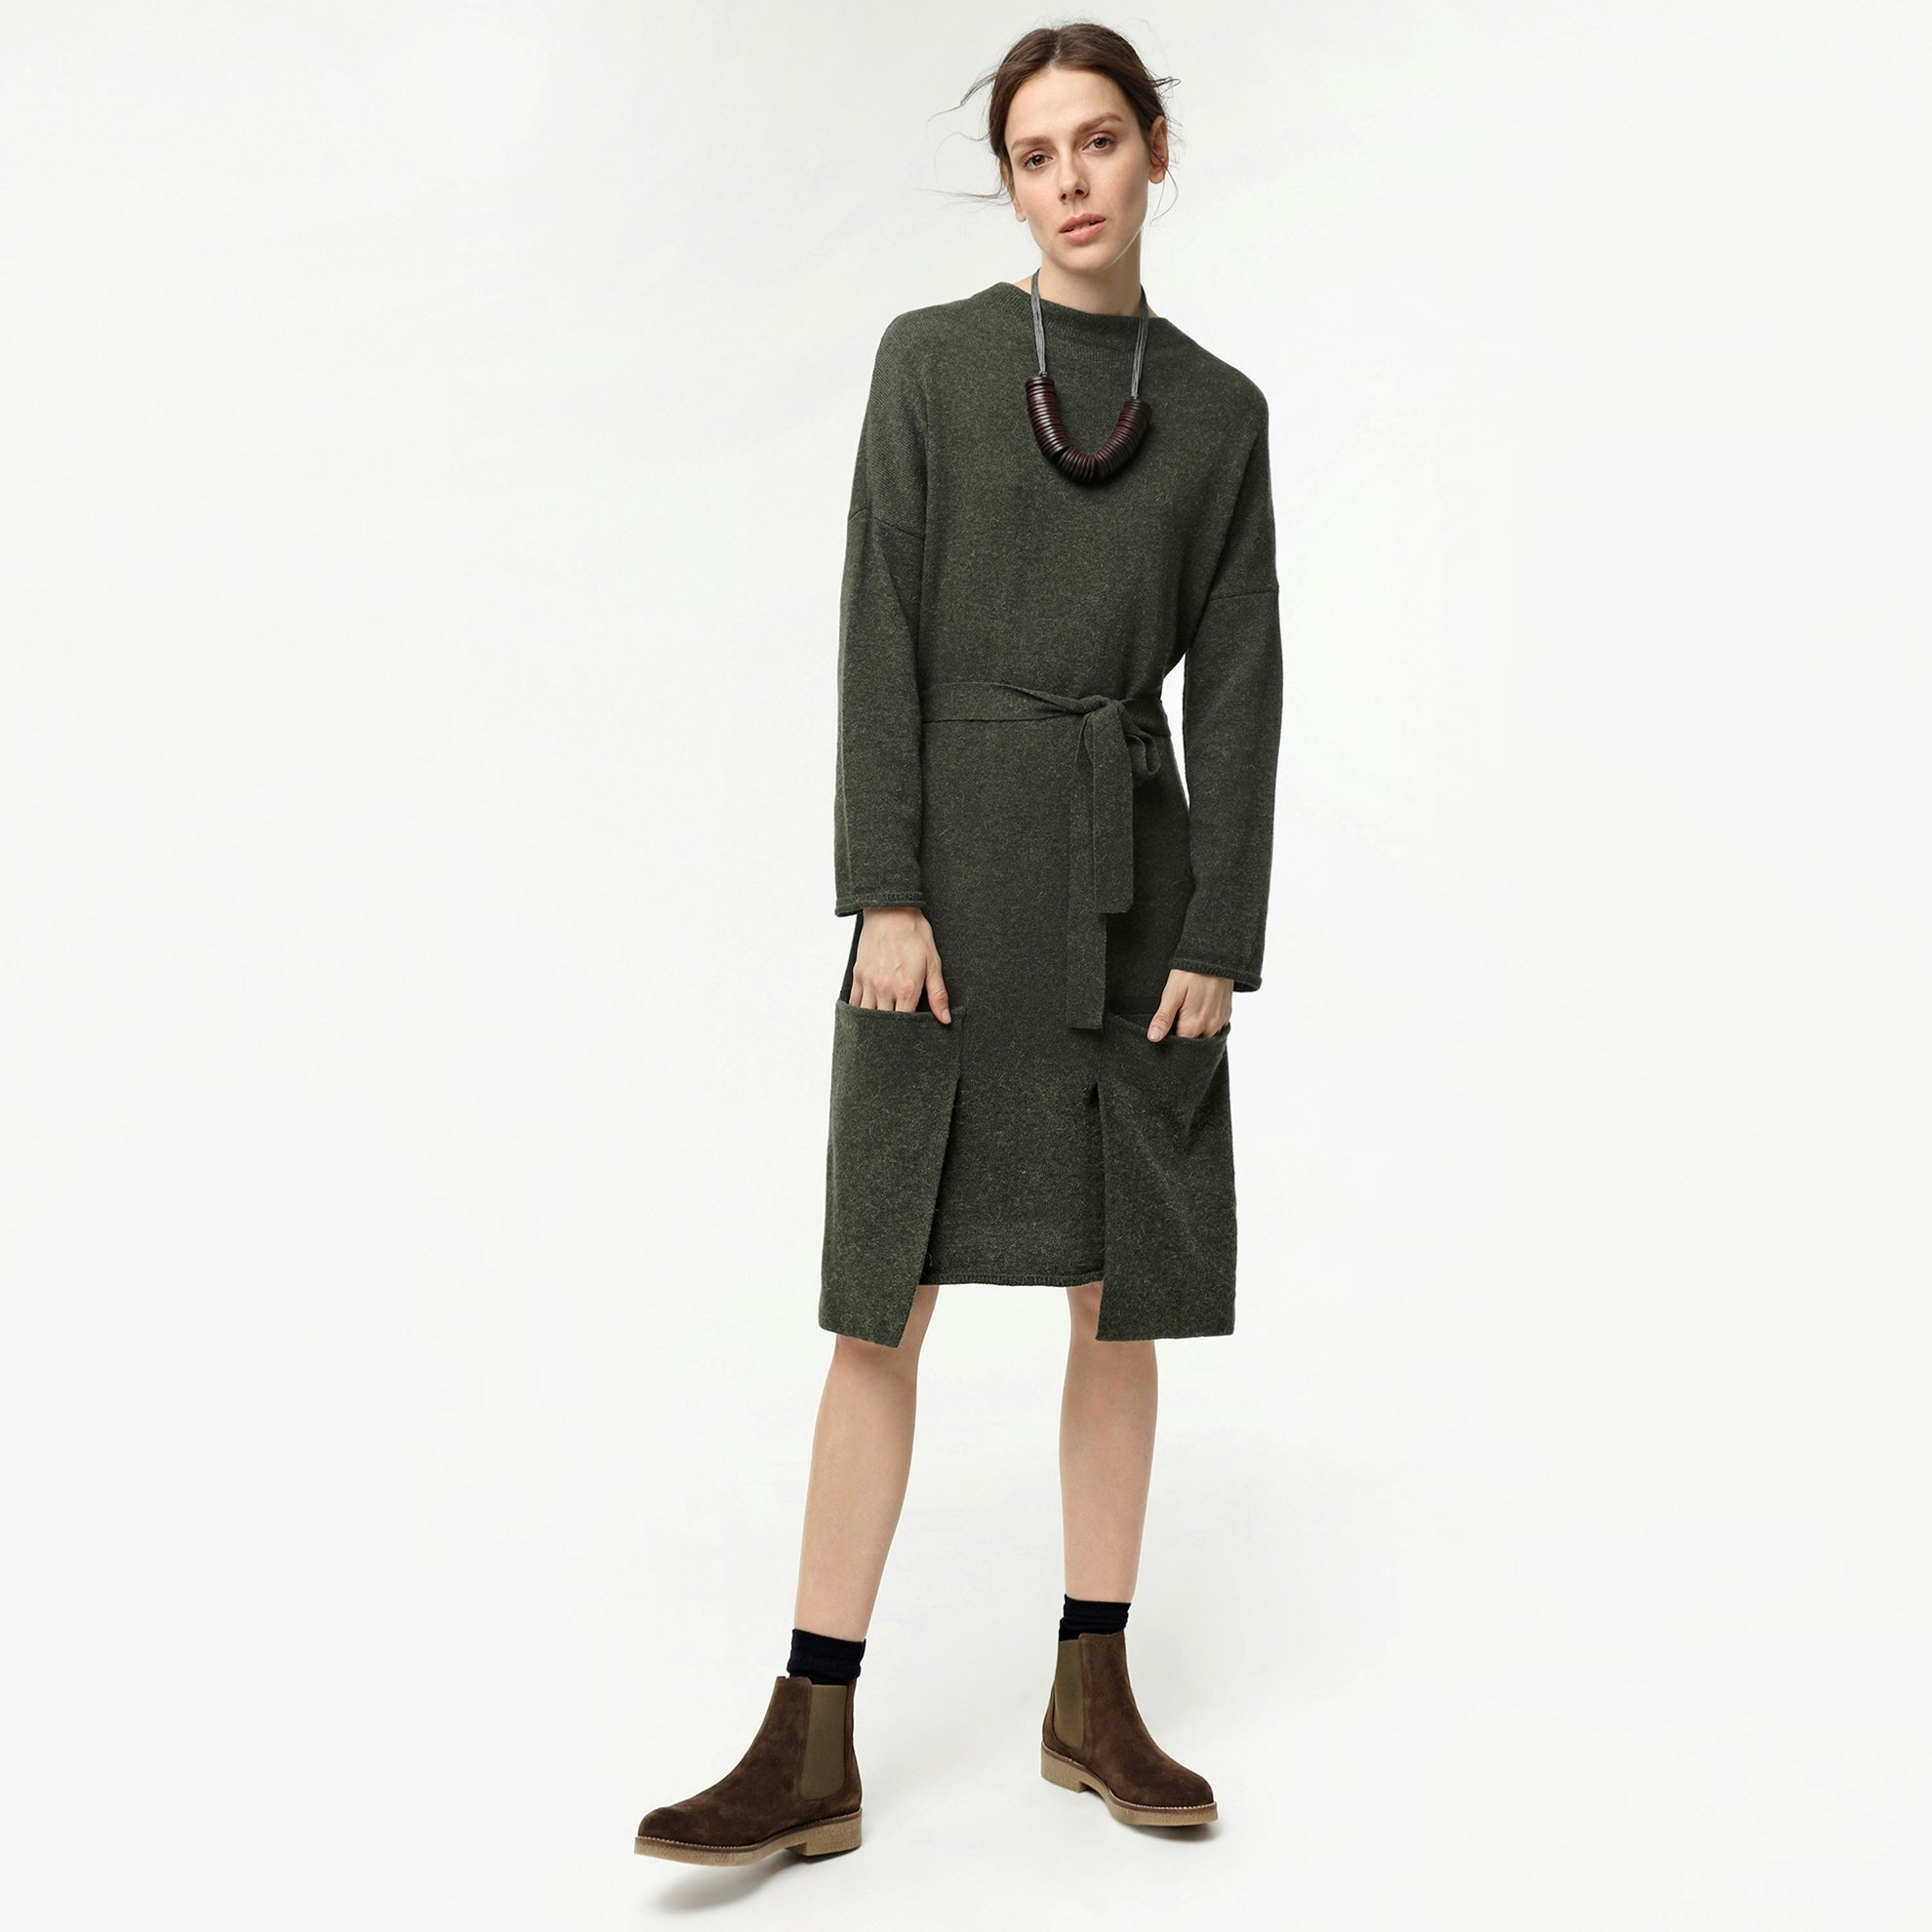 Cep Detaylı Triko Elbise